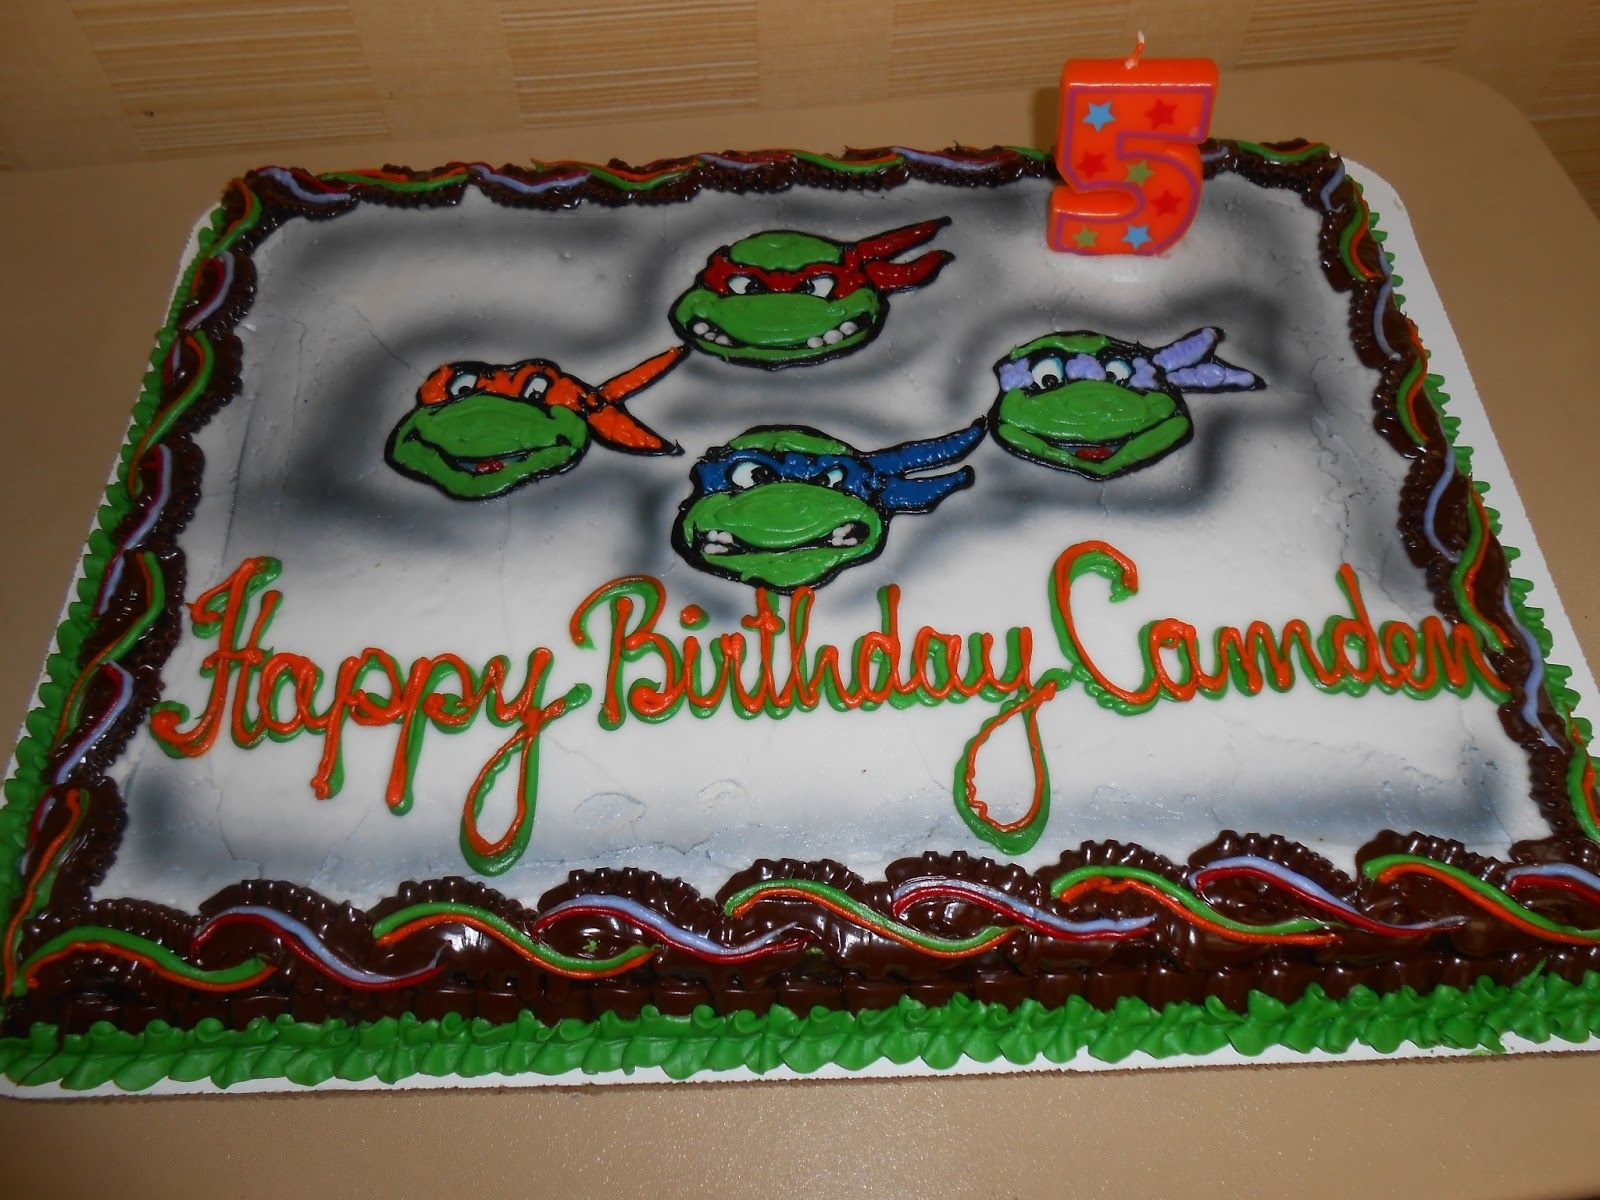 tmnt sheet cakes - Google Search | Sheet cake